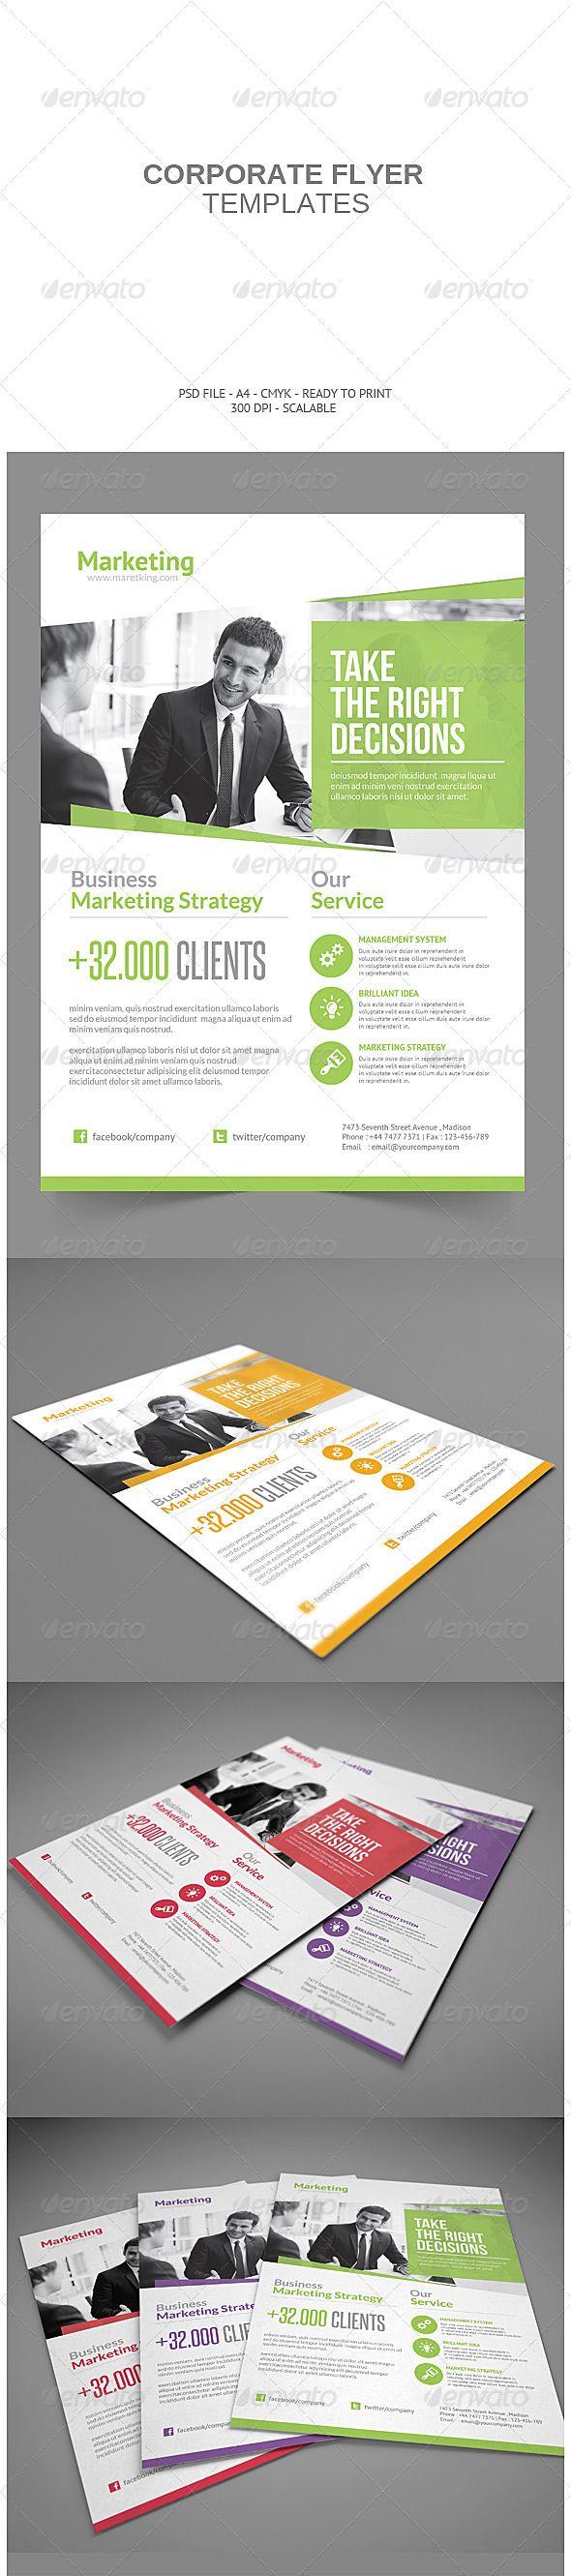 Corporate Flyer - Print Templates